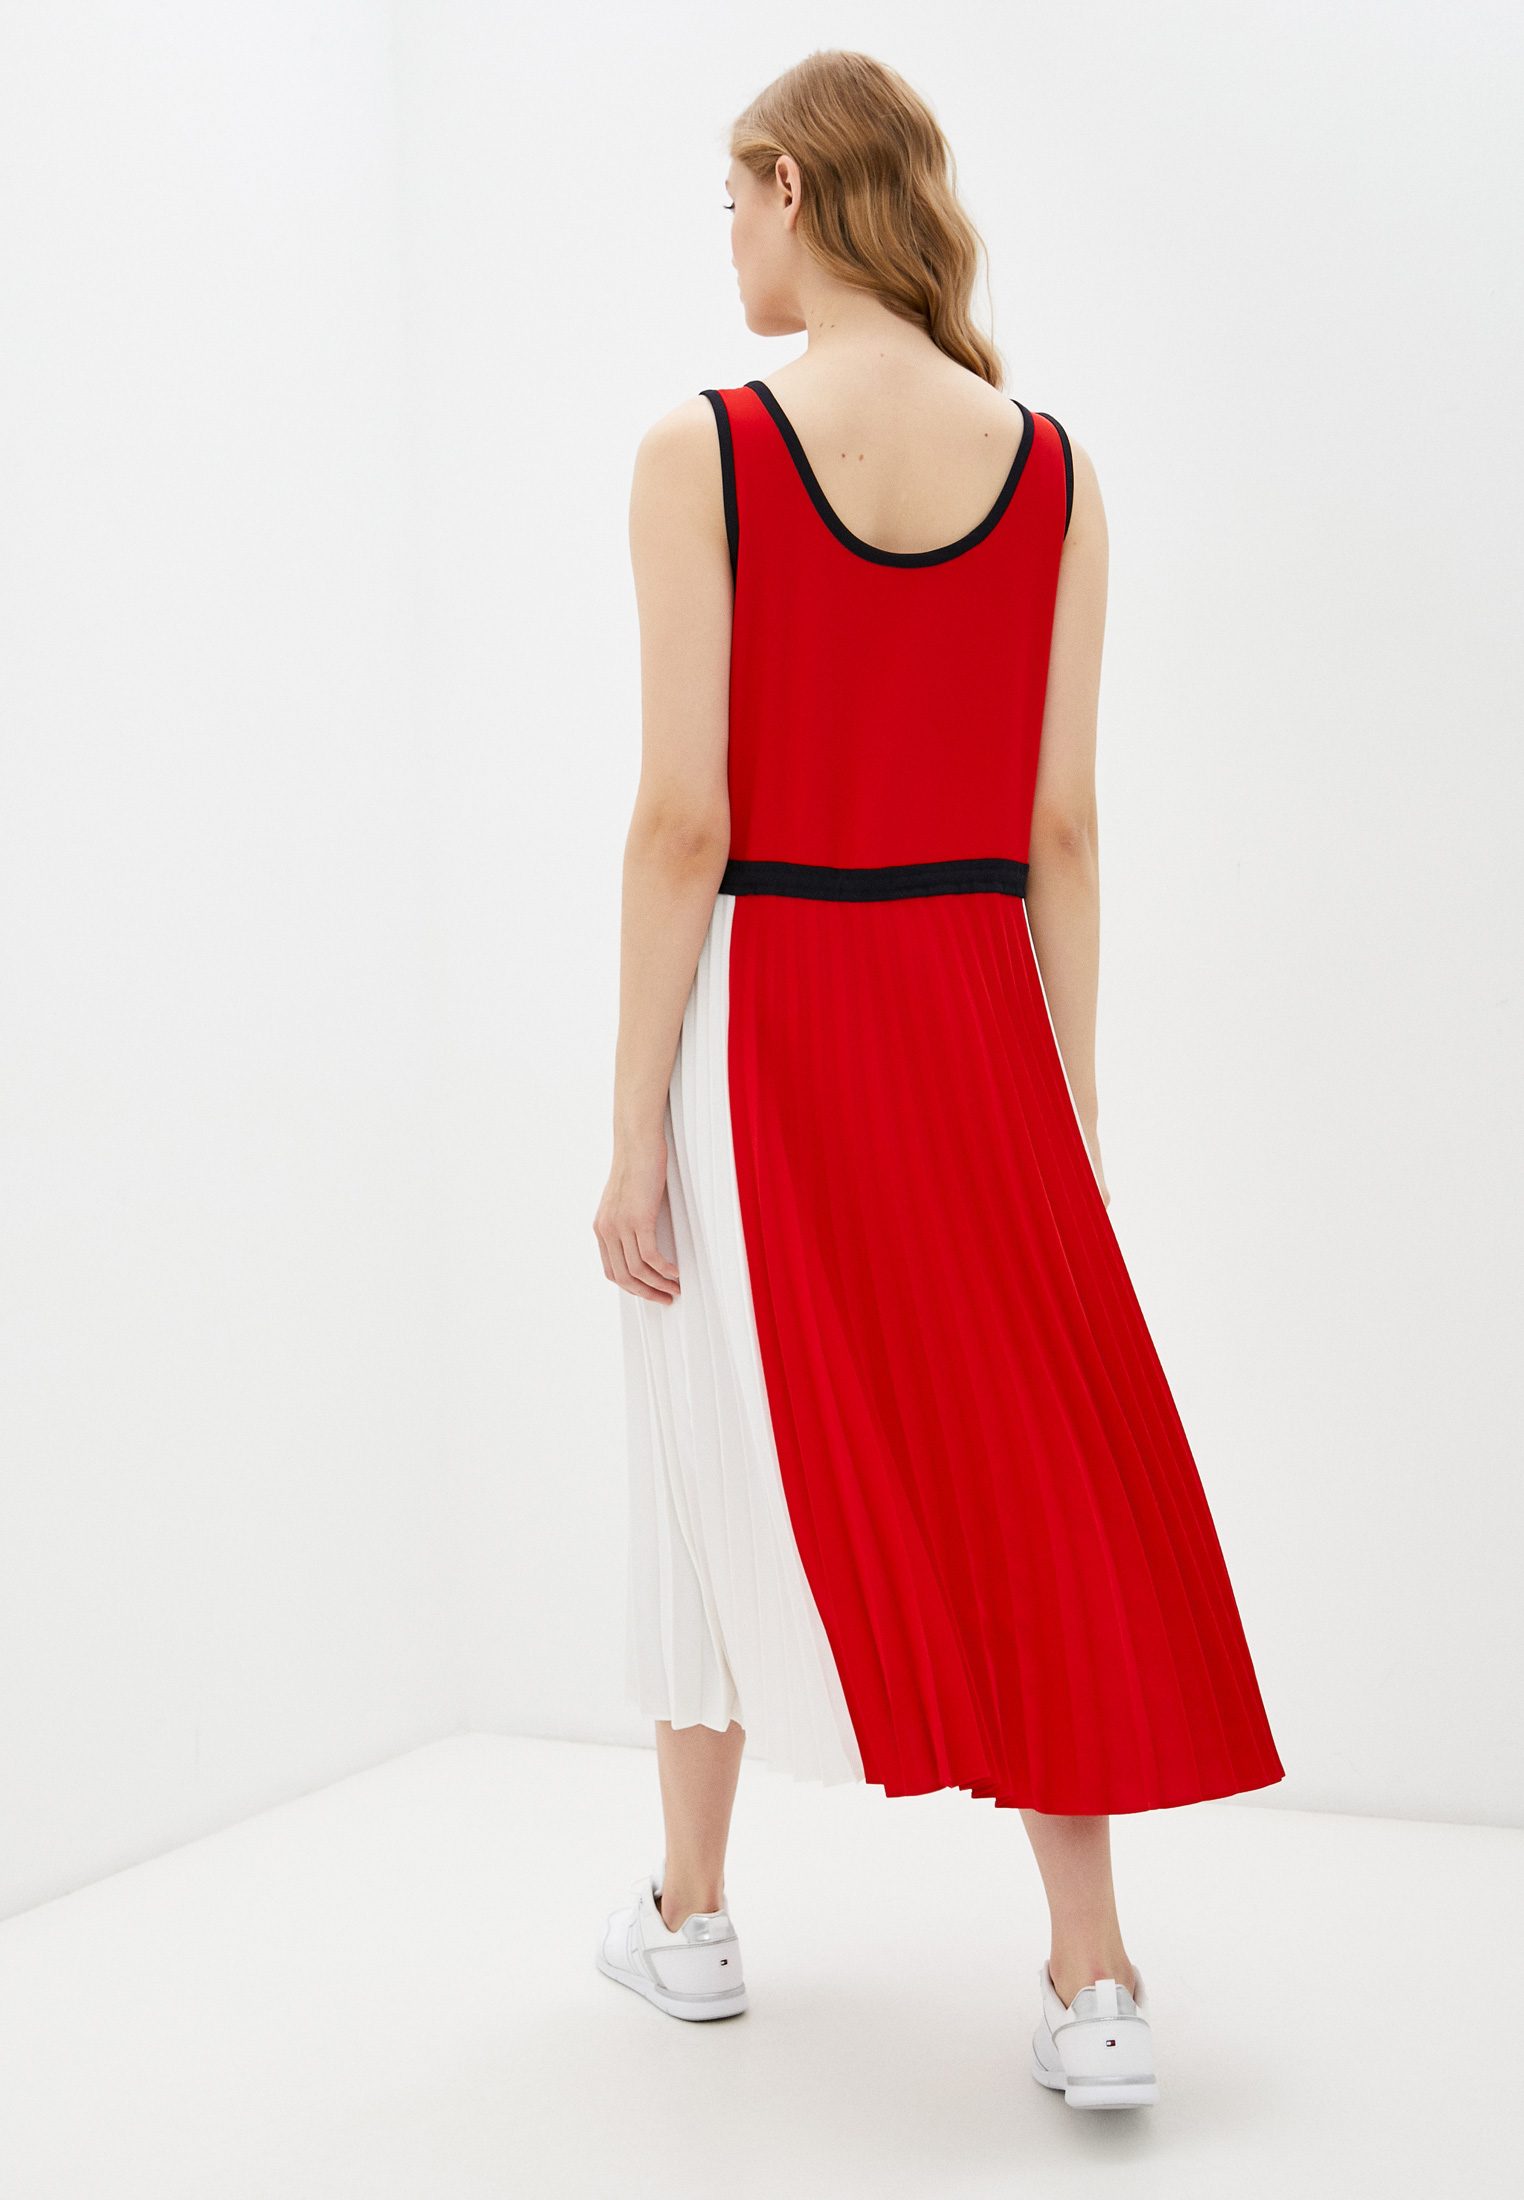 Женские платья-сарафаны Tommy Hilfiger (Томми Хилфигер) WW0WW30643: изображение 3